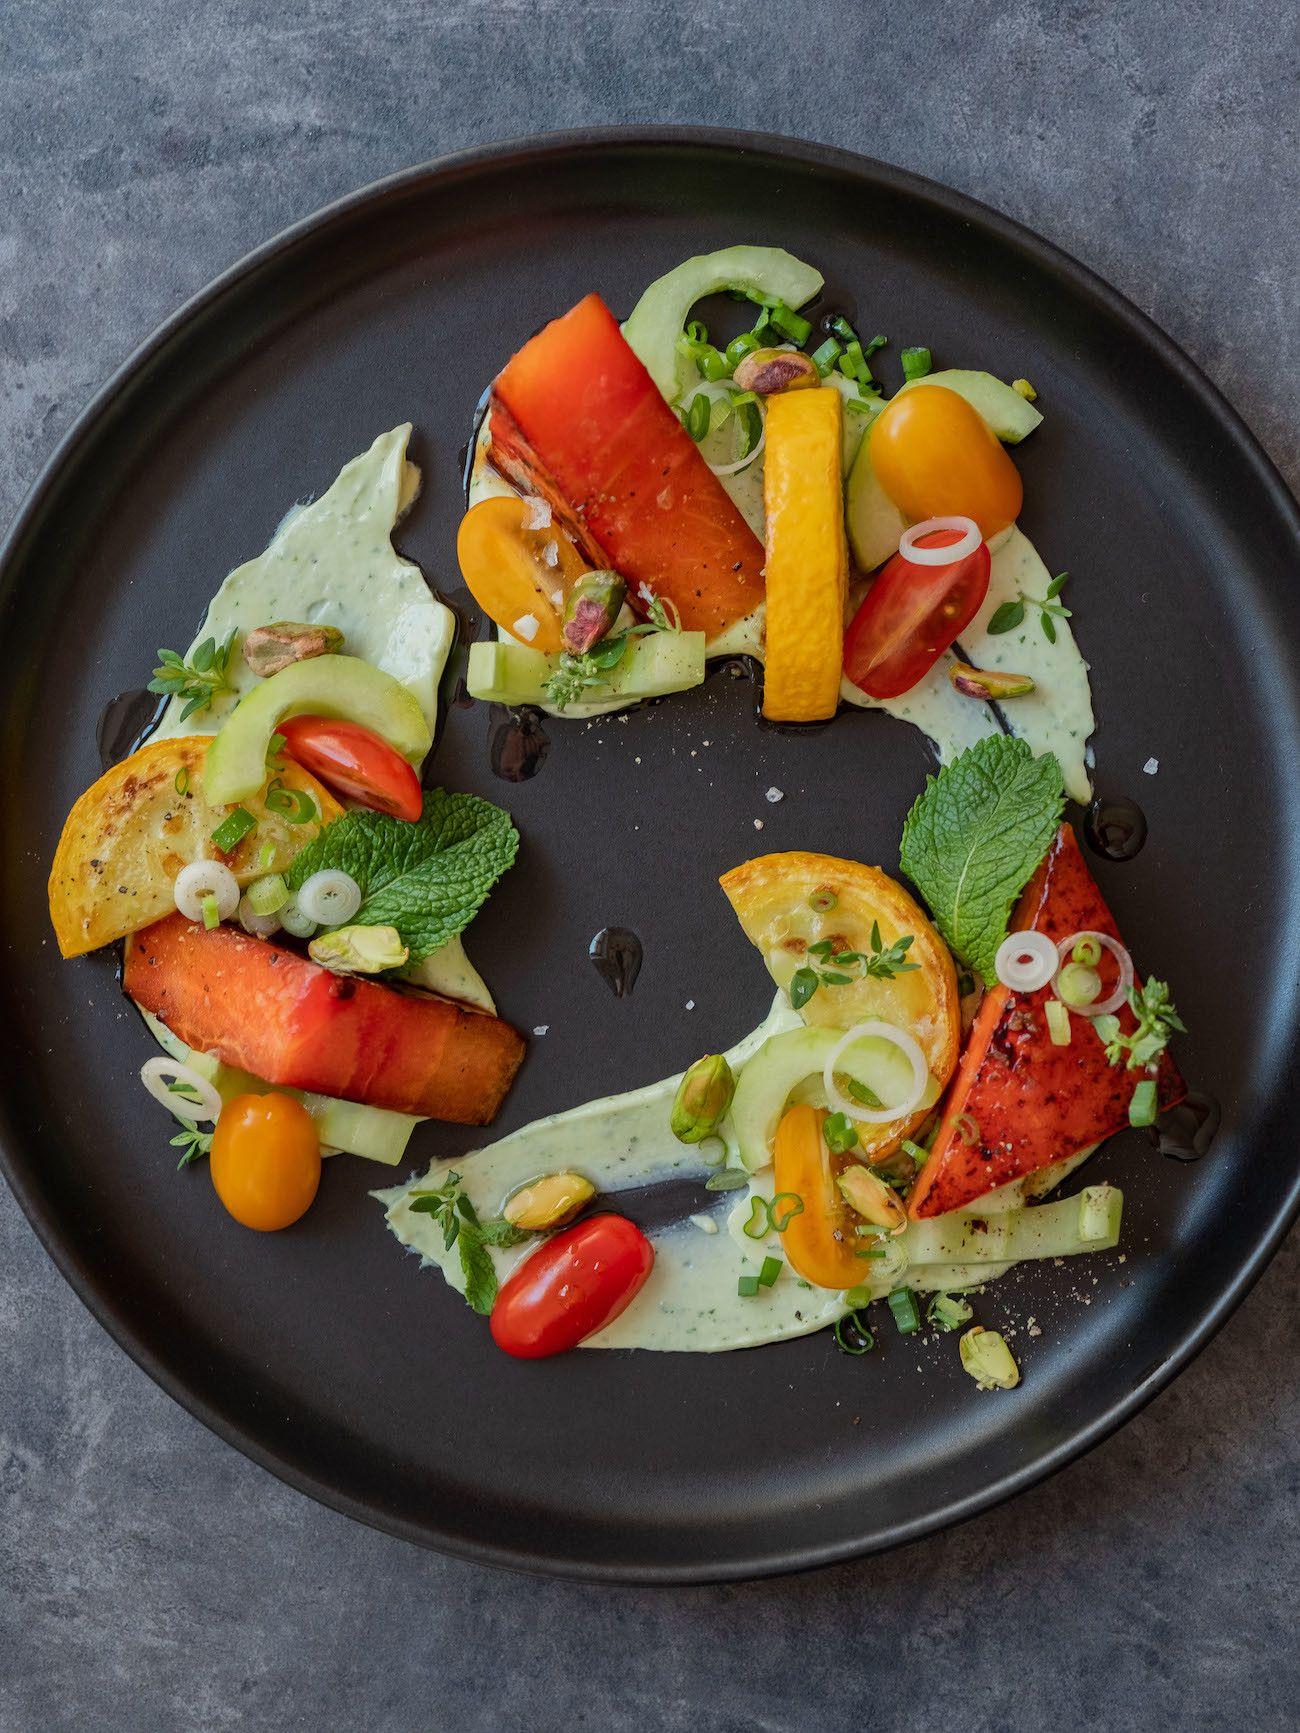 Foodblog, About Fuel, Rezept, Wassermelonensalat auf Basilikum-Feta-Creme, Minze